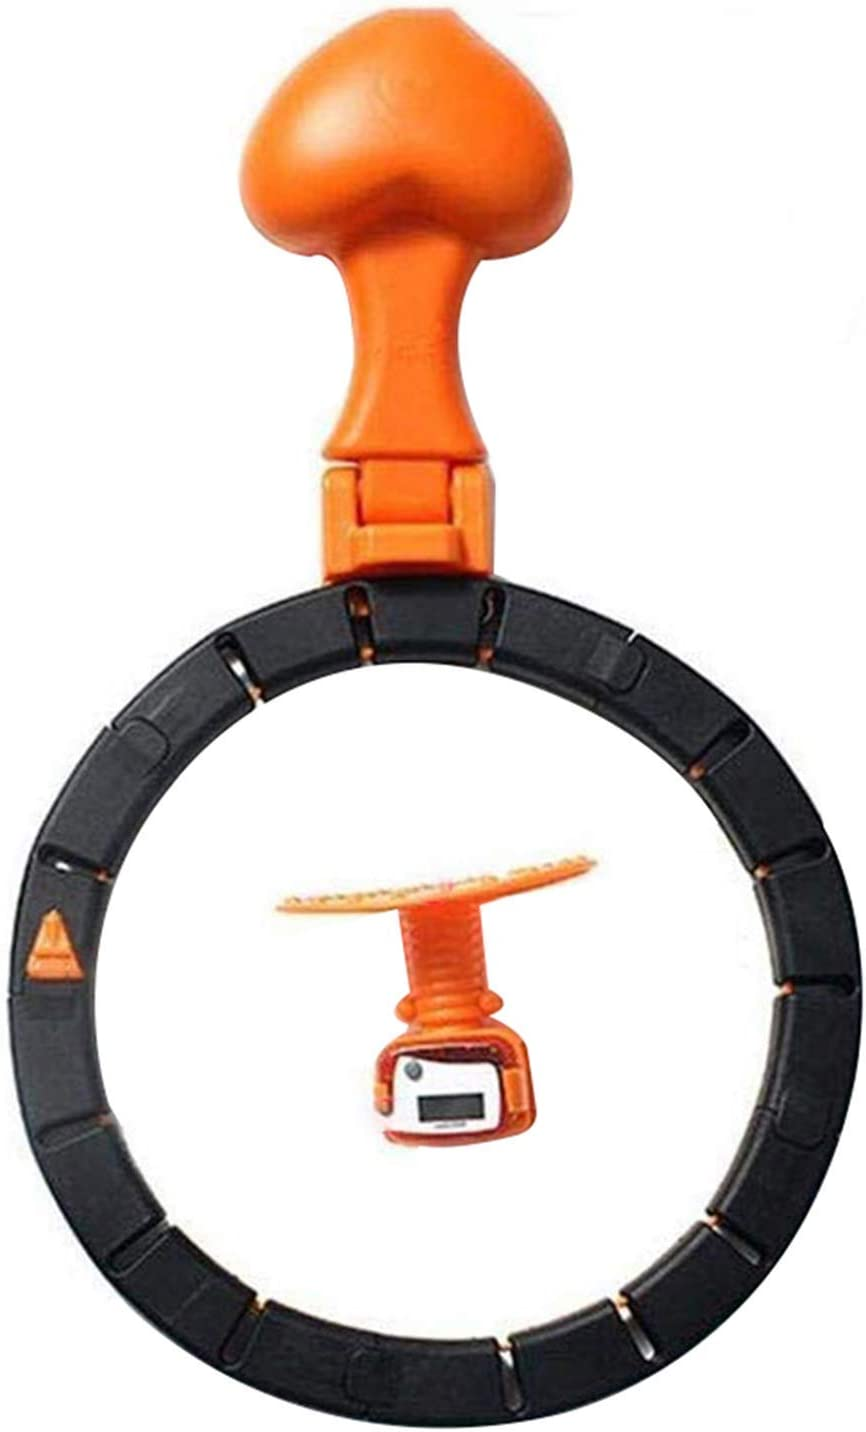 Exercise Hula Loop Hoop Detachable Portable Circle Smart Lose Weight Fitness NEU